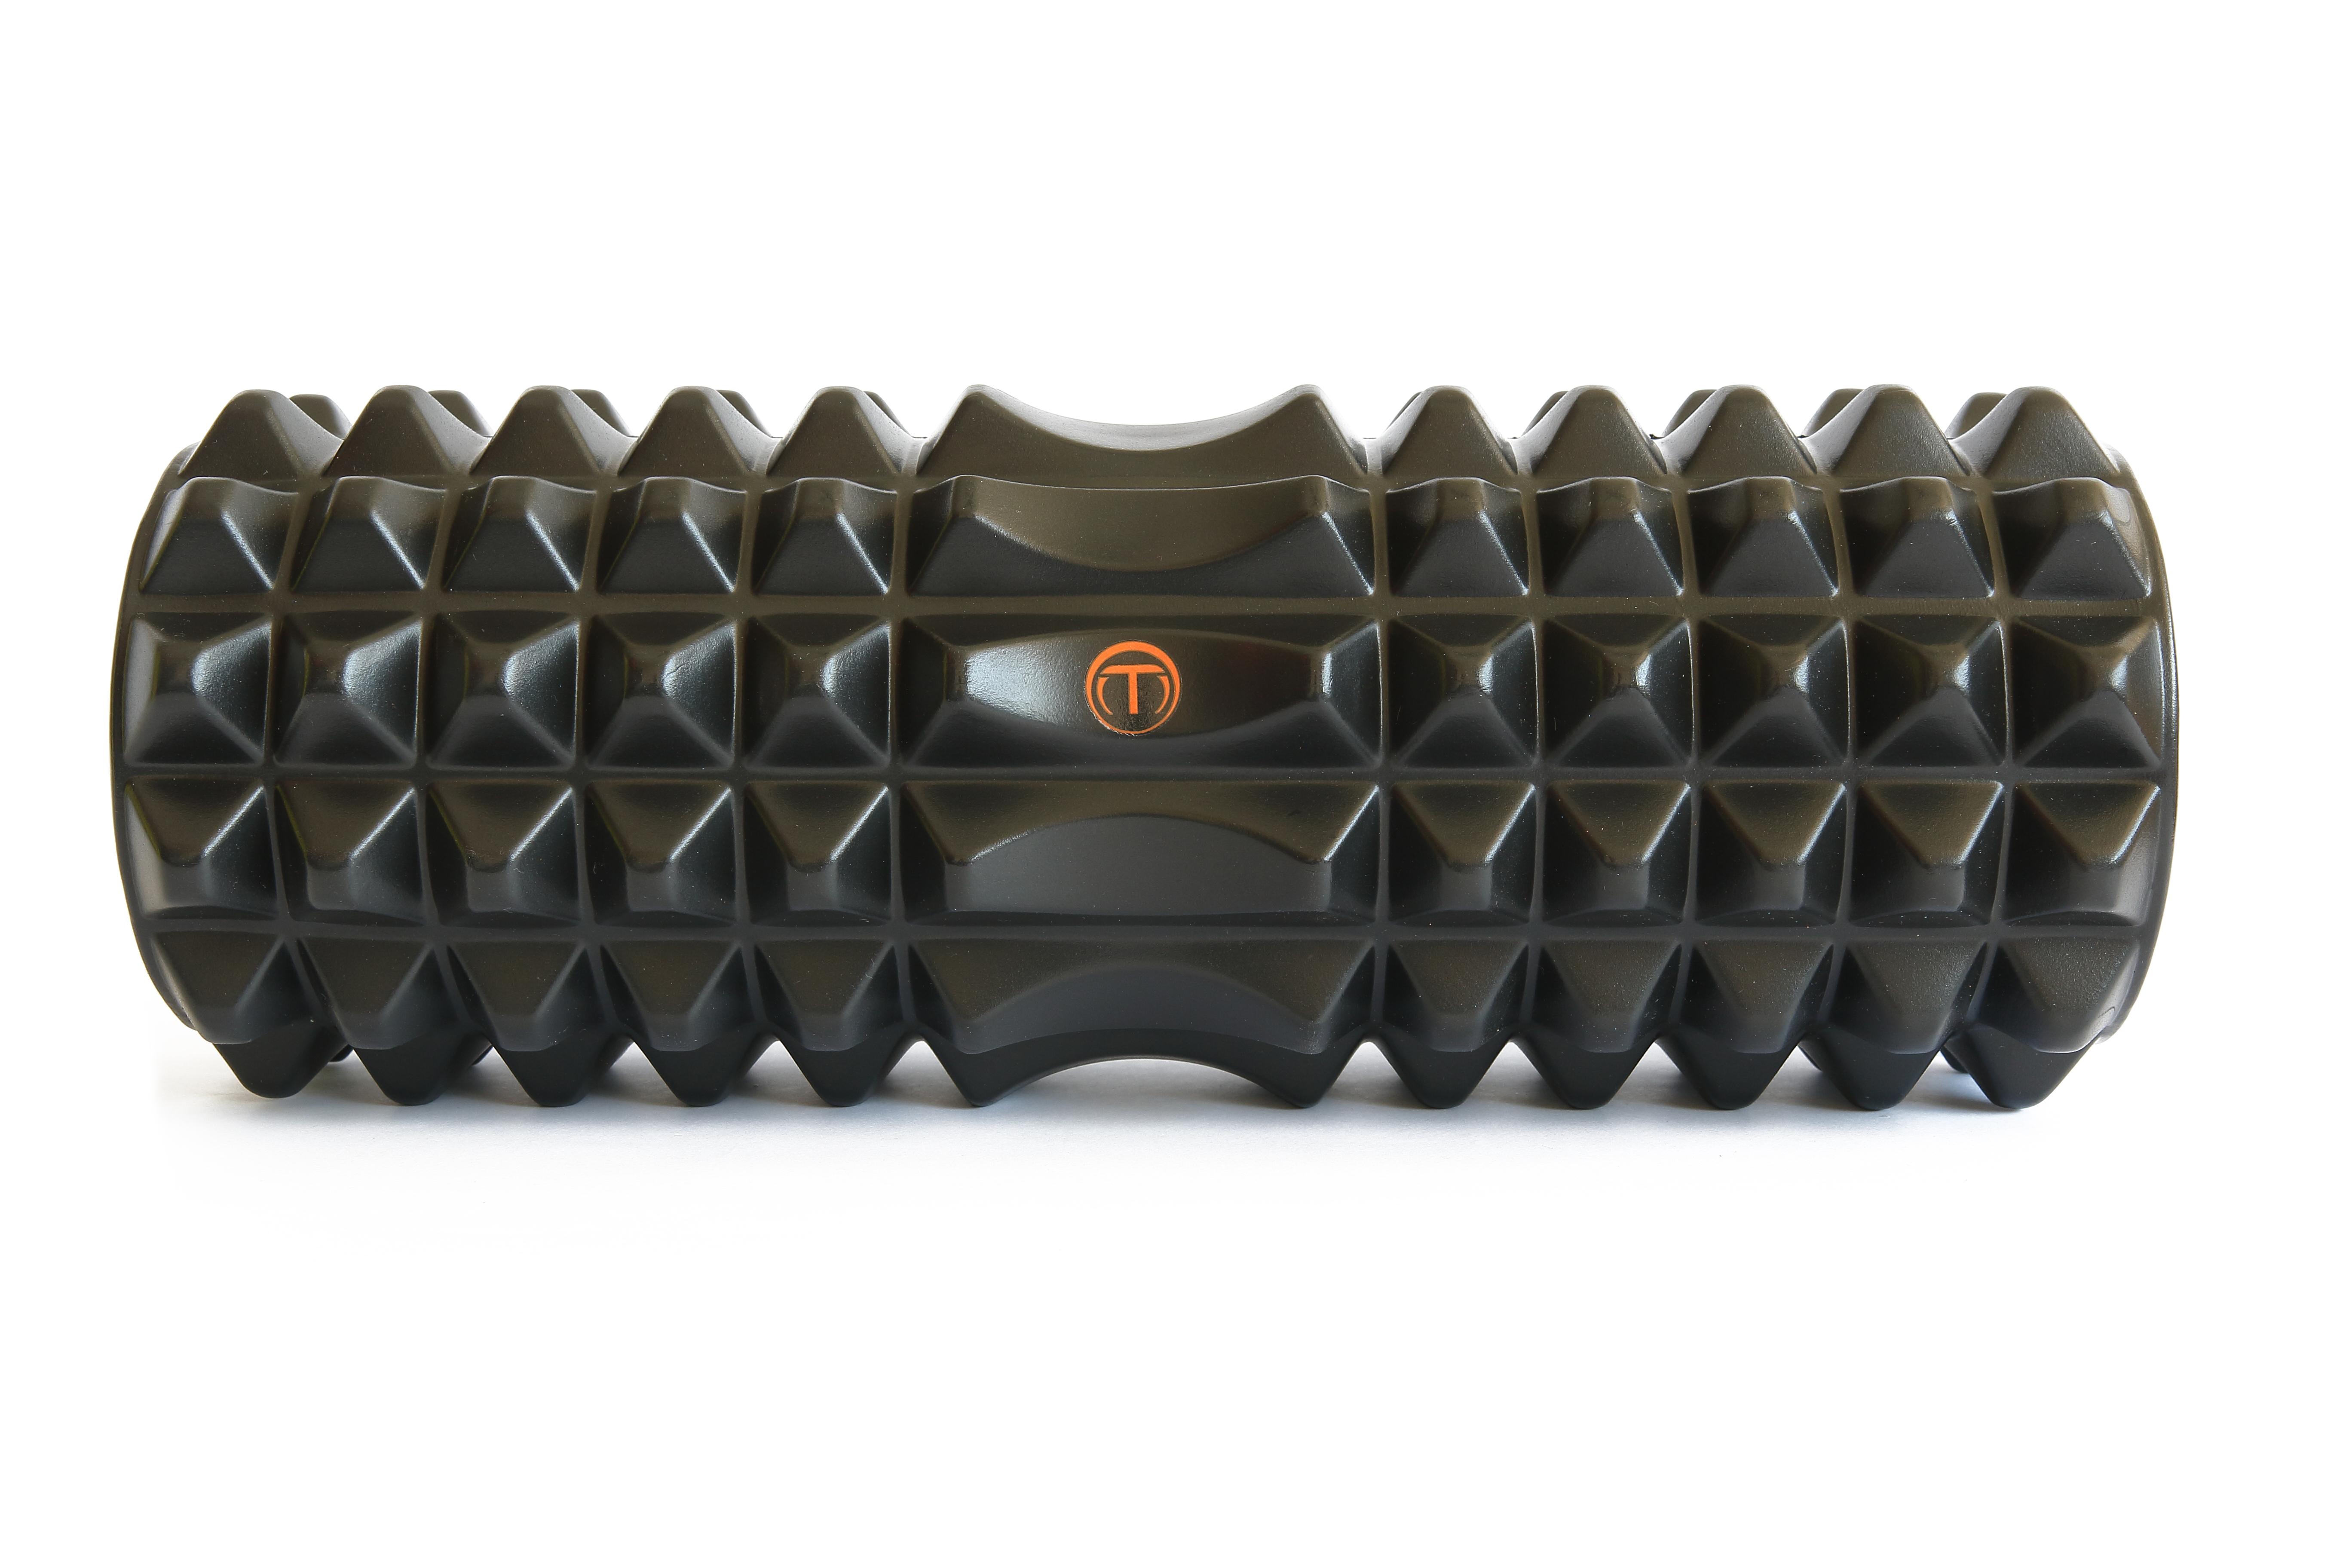 Best Iphone X Wallpaper Free Stock Photo Of Foam Roller Foam Roller Exercises